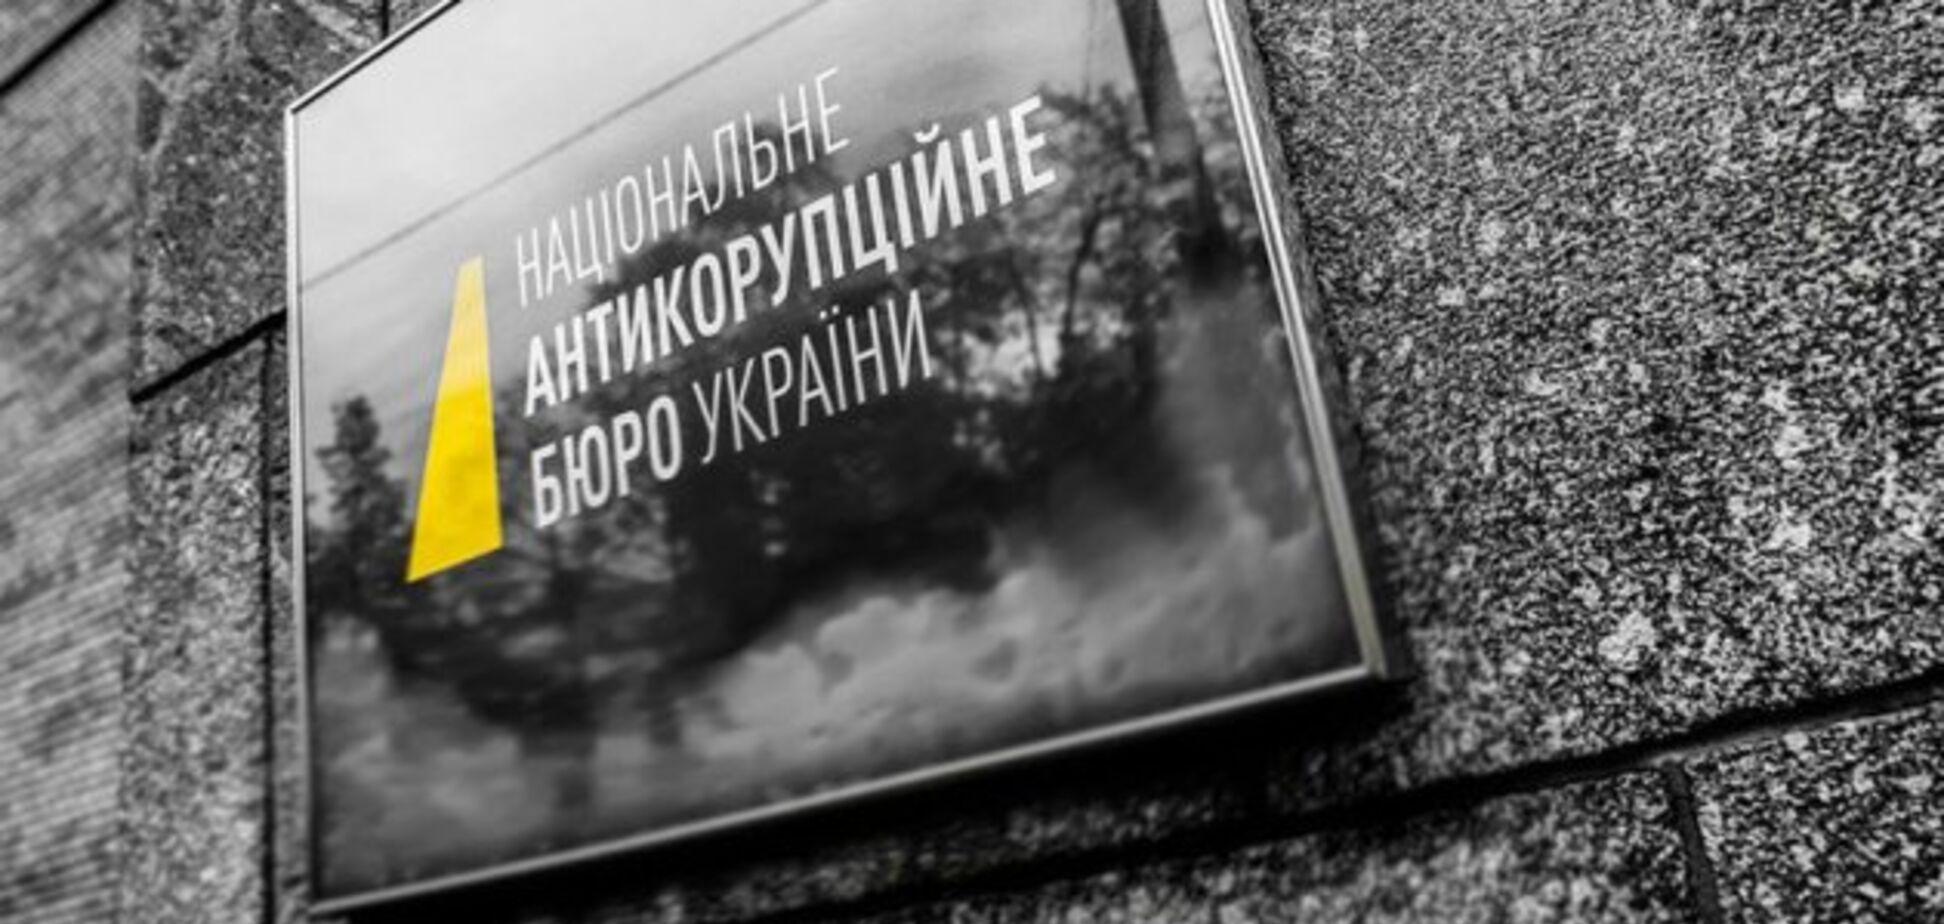 Дії НАБУ наносять непоправну шкоду Україні